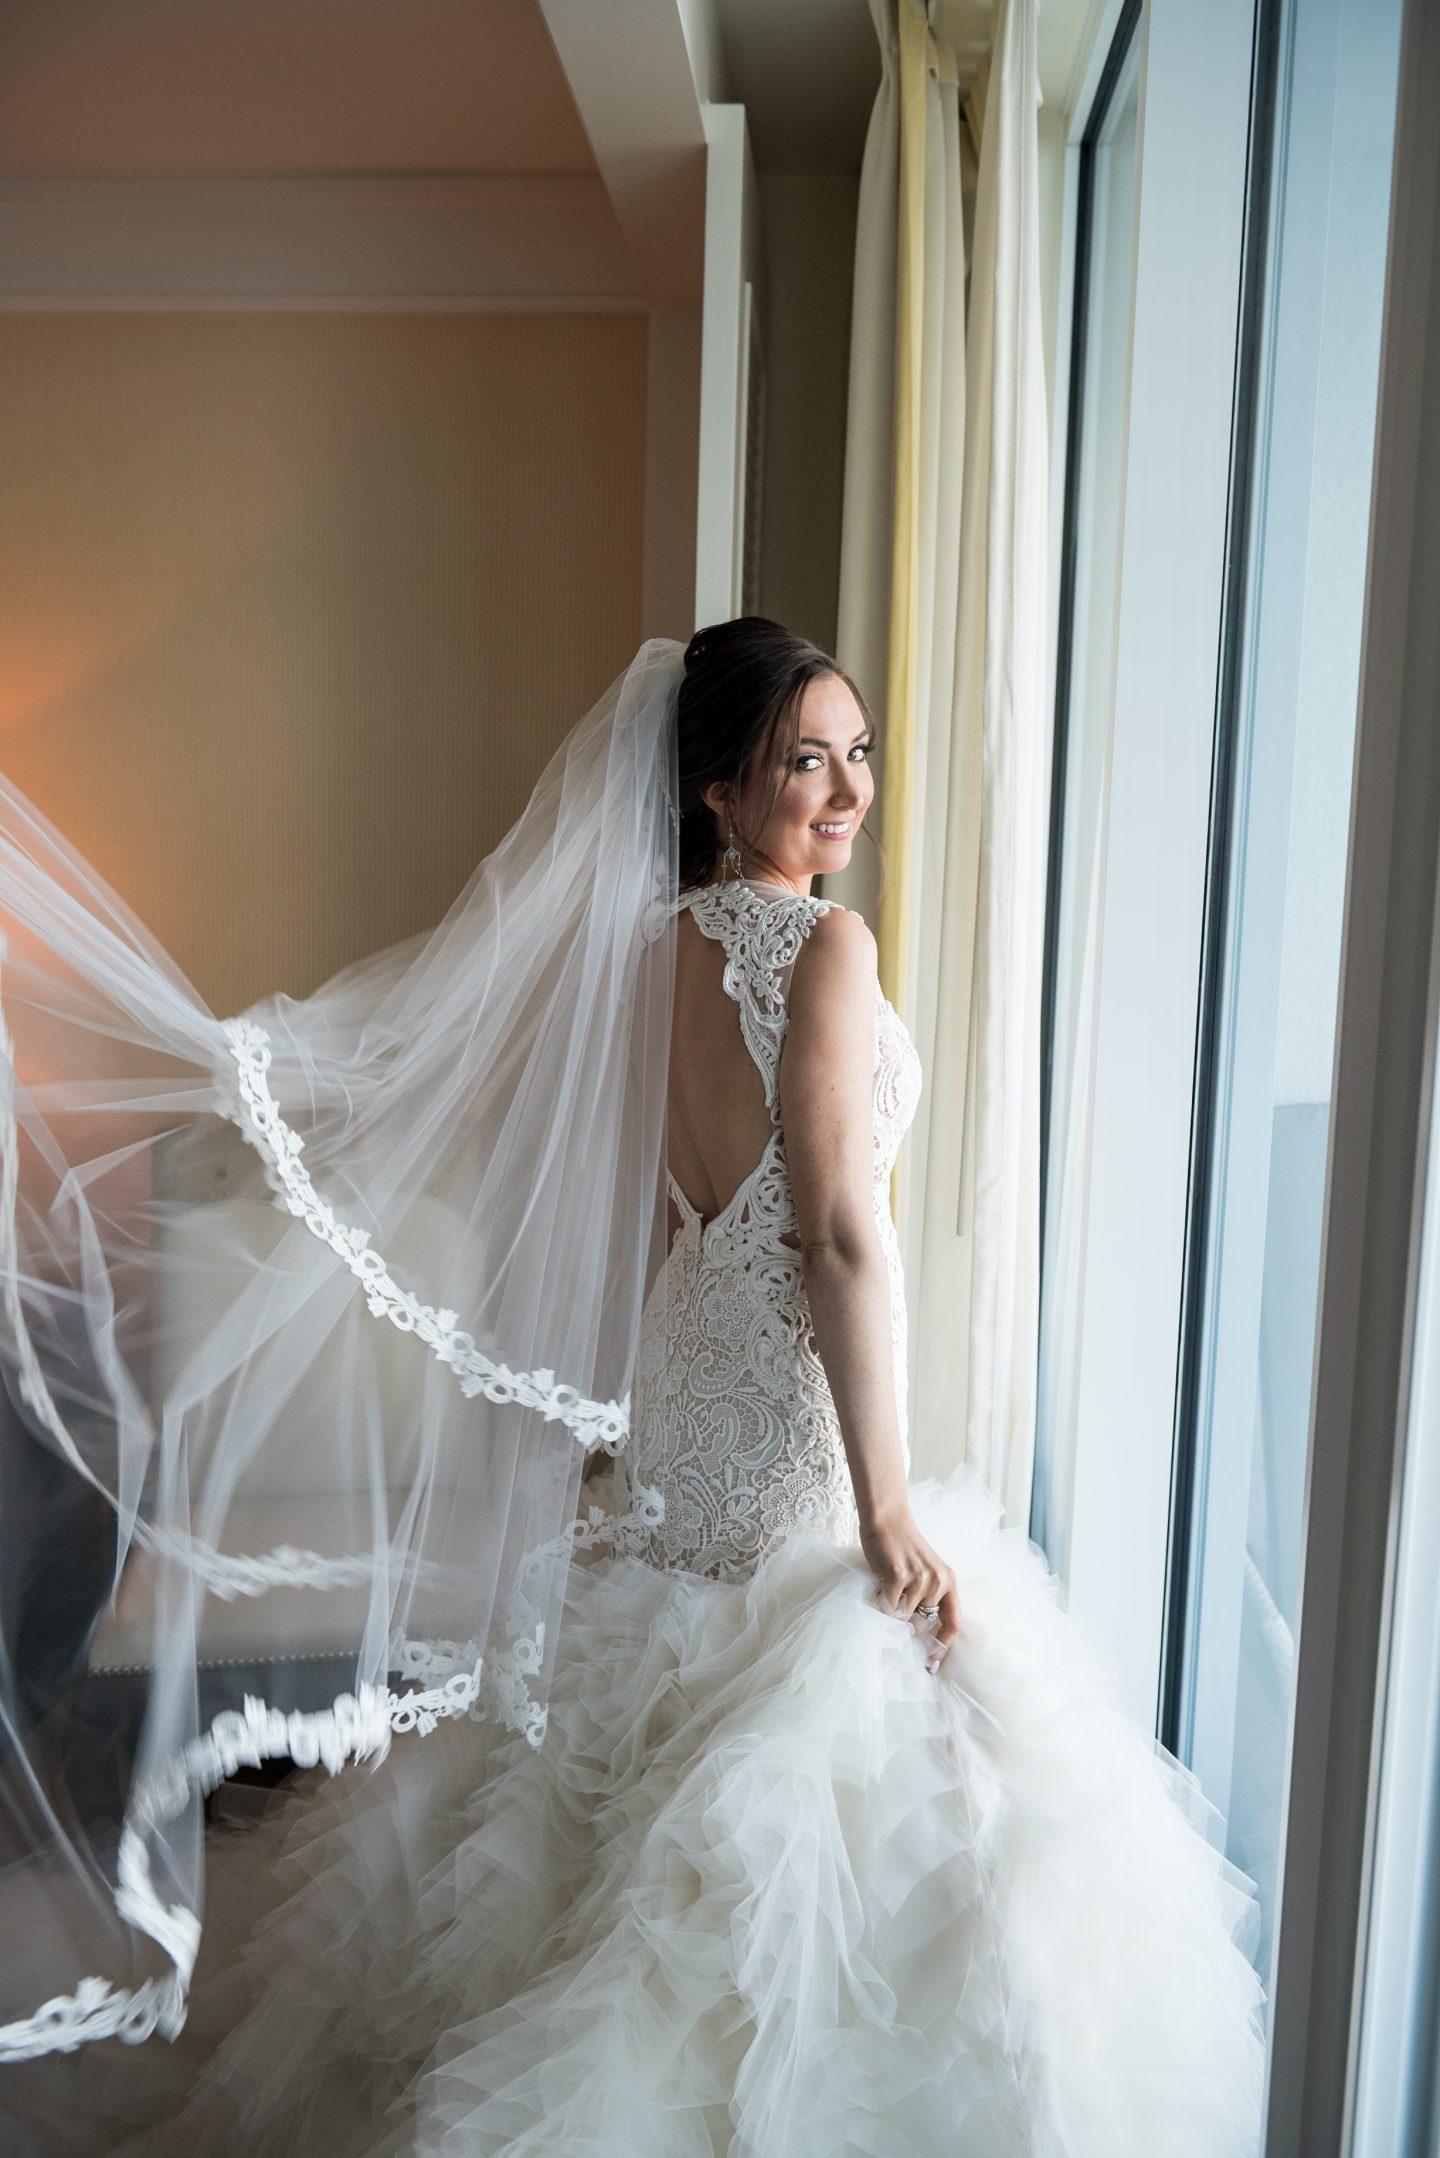 Choosing a wedding dress: What I wore to my fairytale wedding